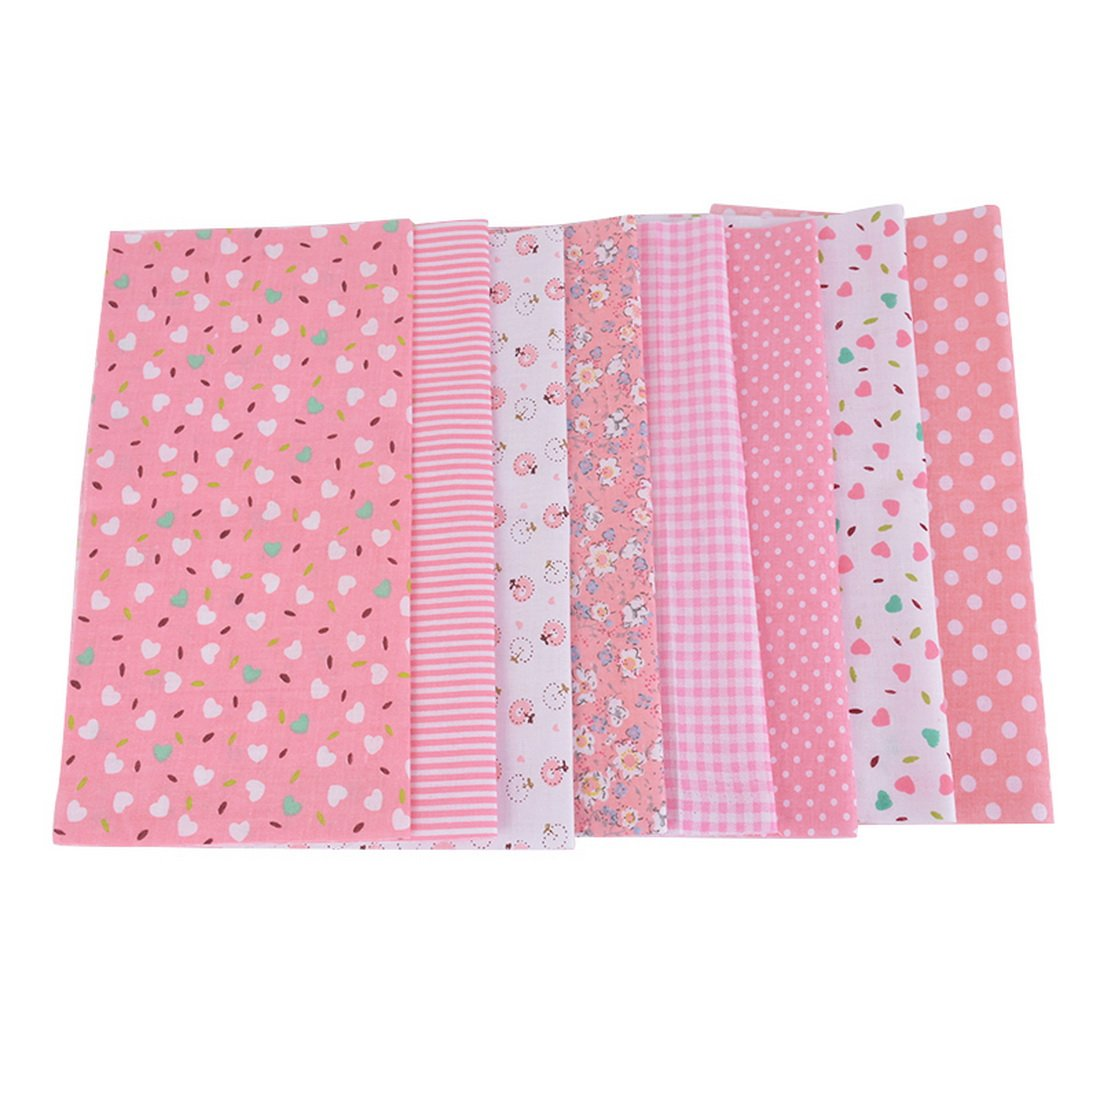 Souarts Cotton Floral Fabric Bundles Quilting Sewing Patchwork Cloths DIY CraftYellow 25x25cm 7pcs